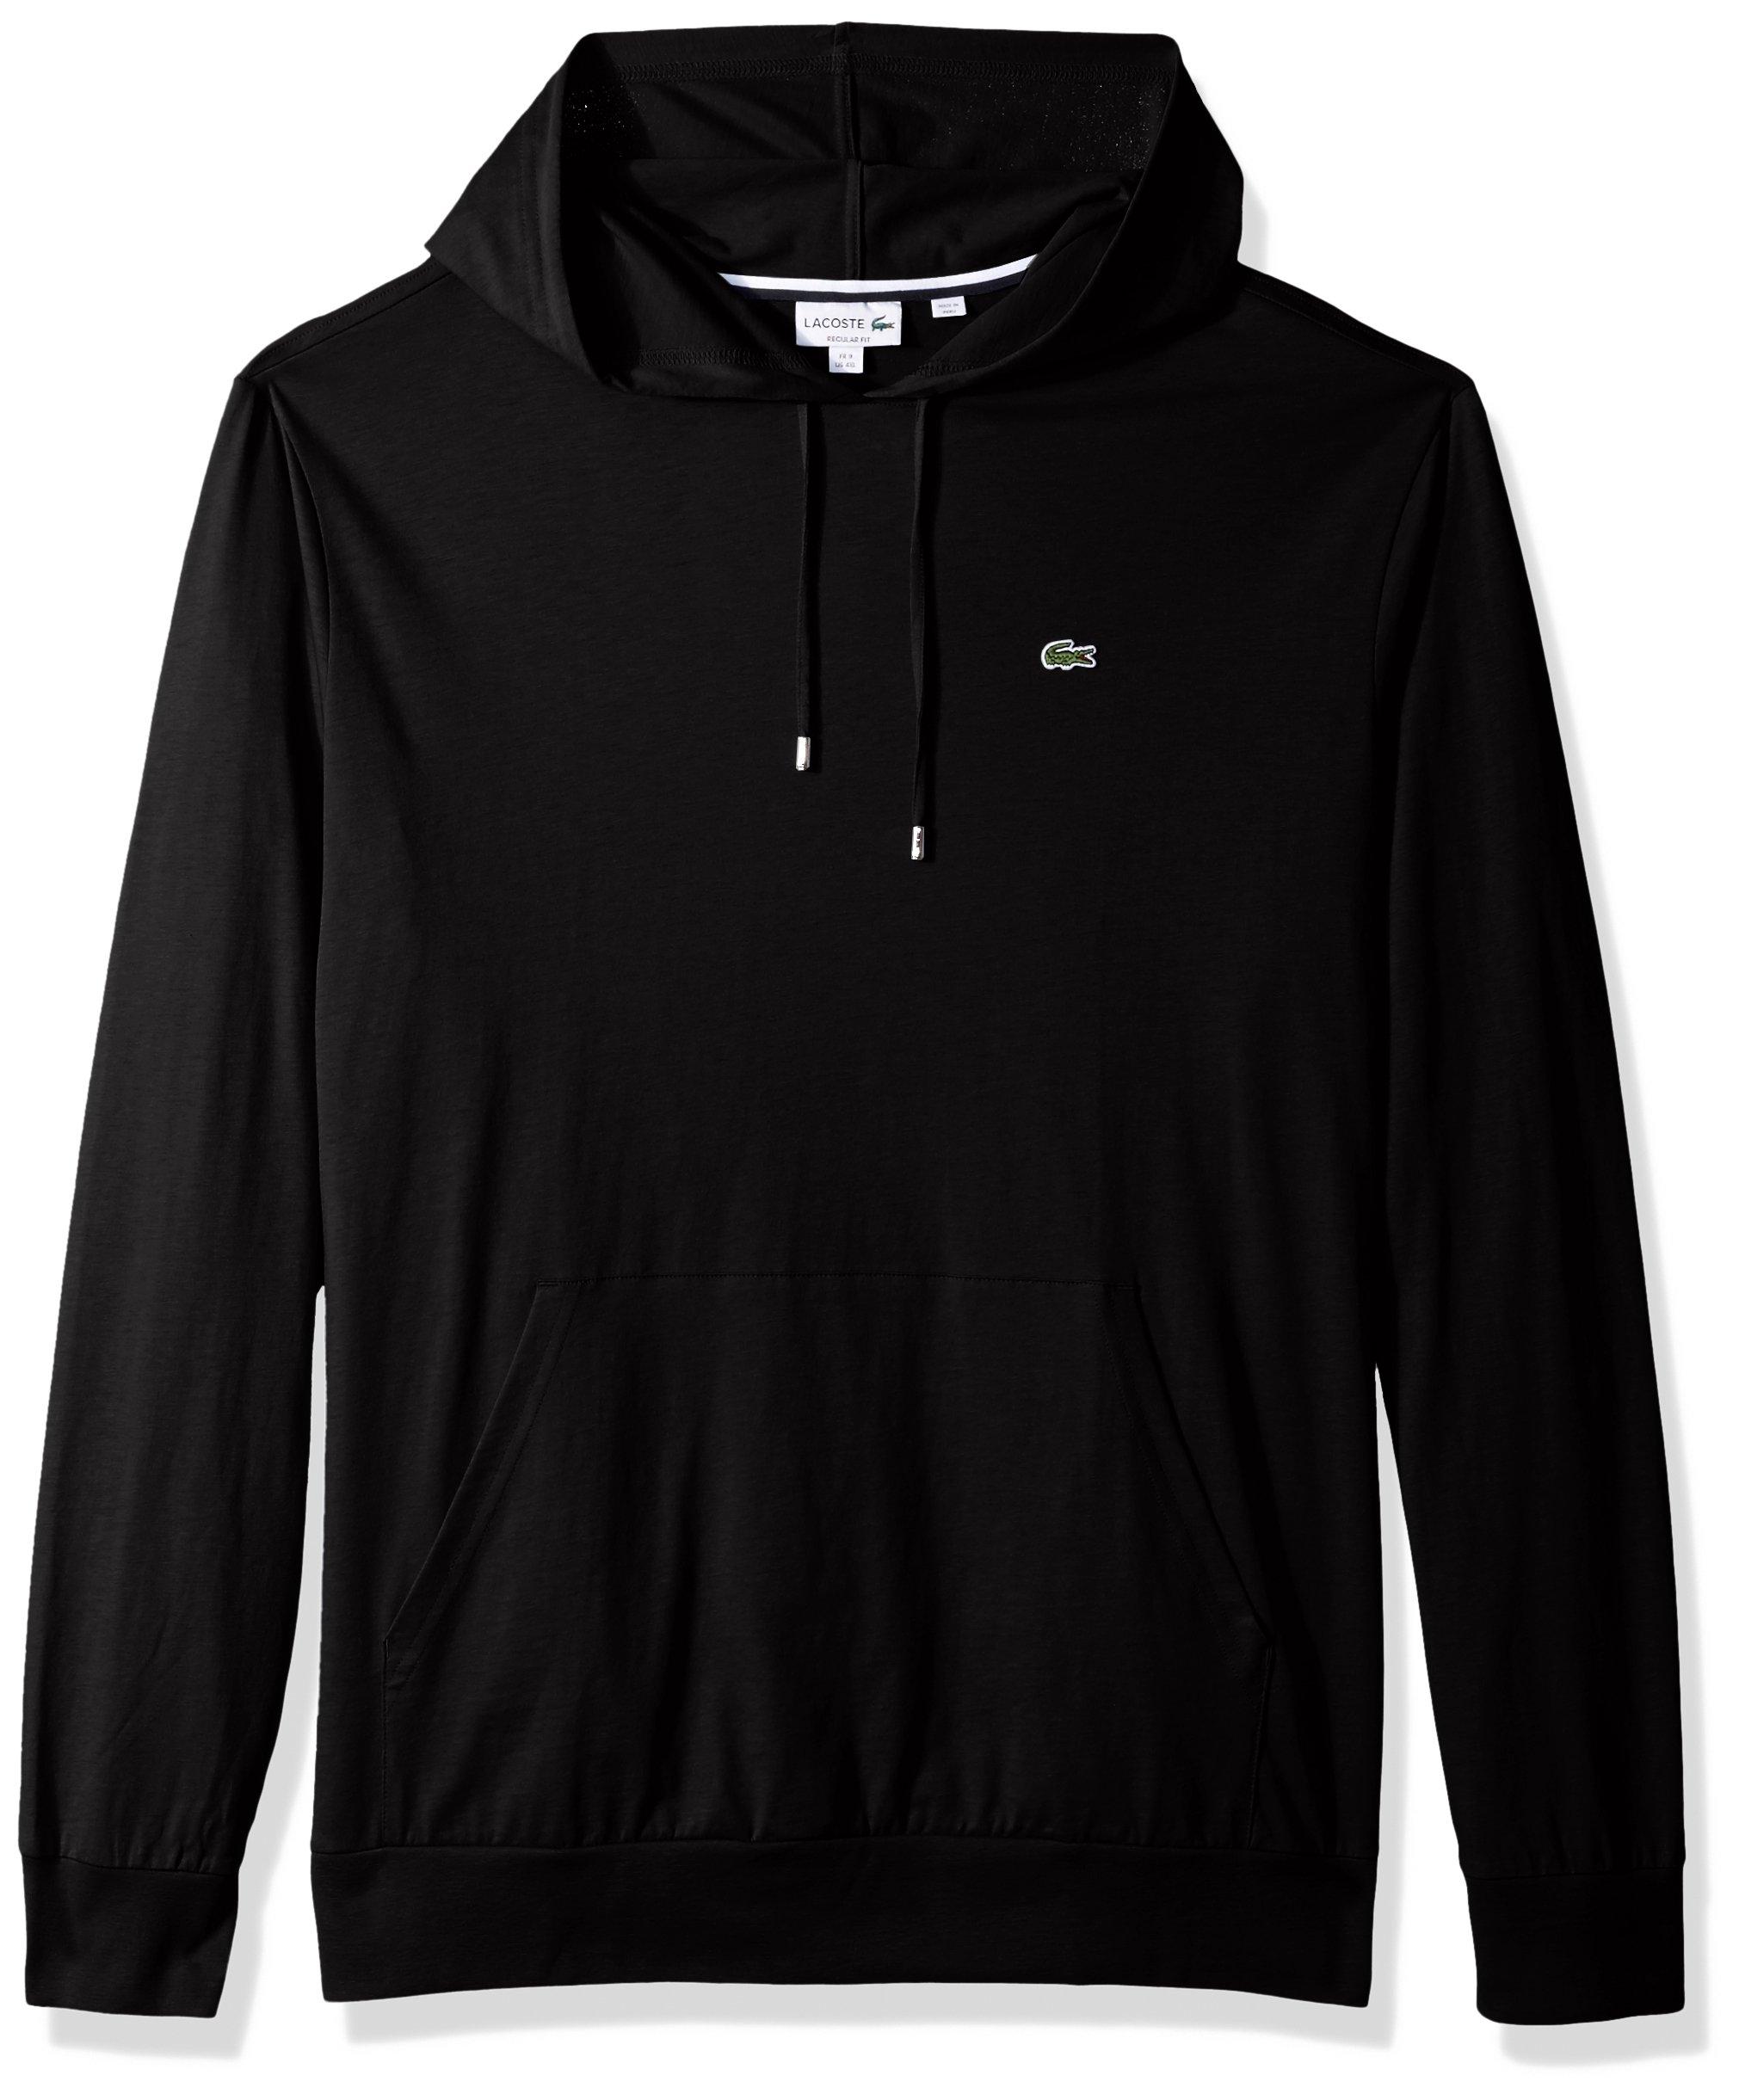 Lacoste Men's Long Sleeve Hooded Jersey Cotton